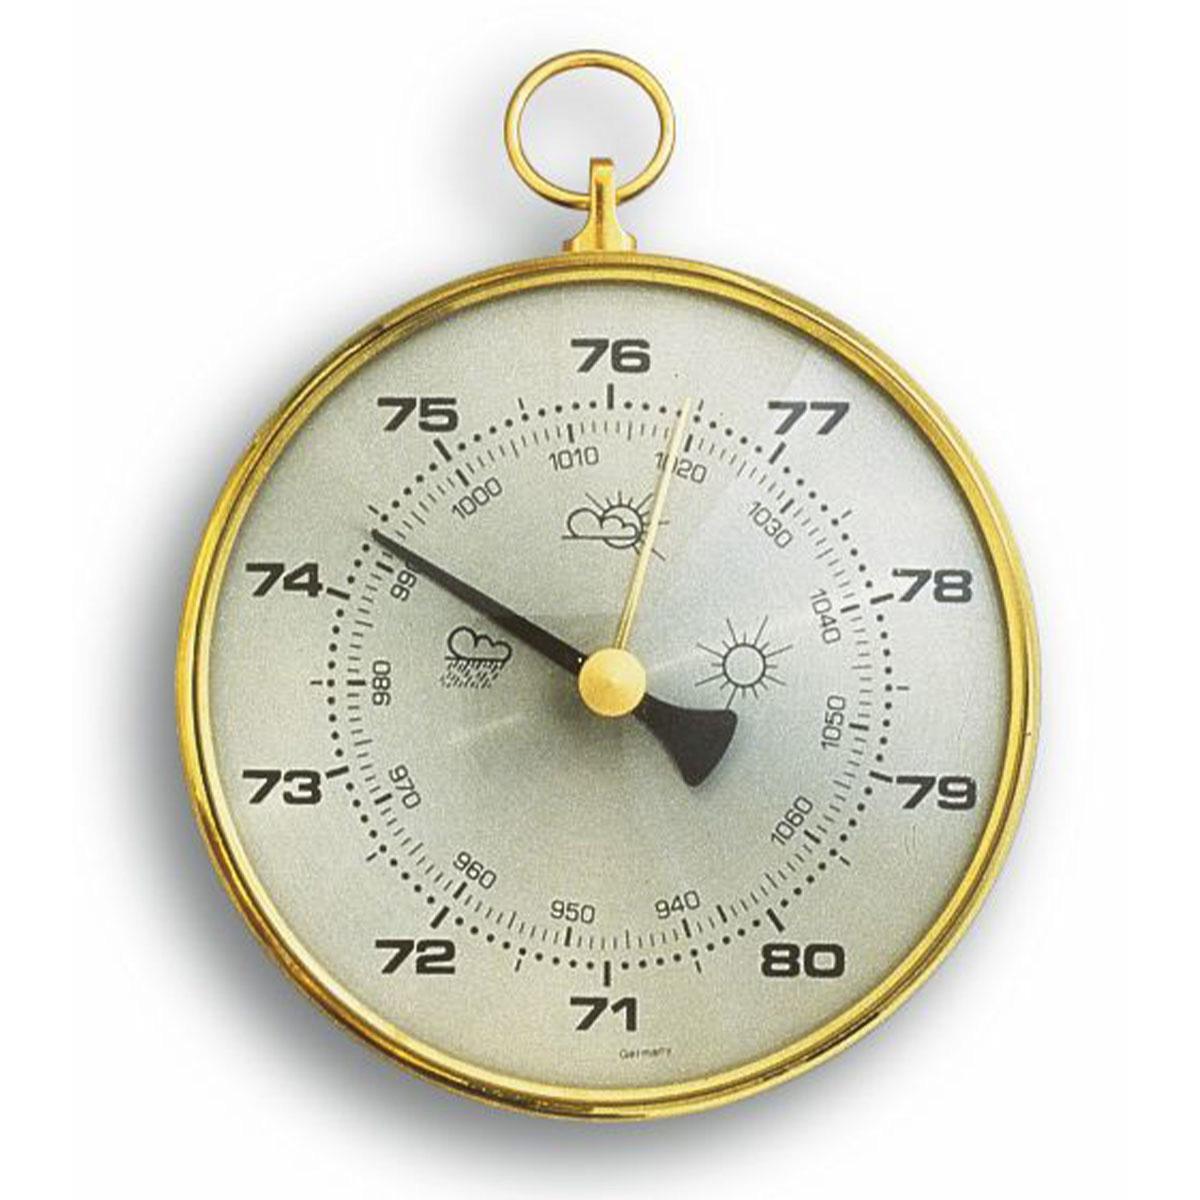 29-4003-analoger-barometer-messingring-1200x1200px.jpg